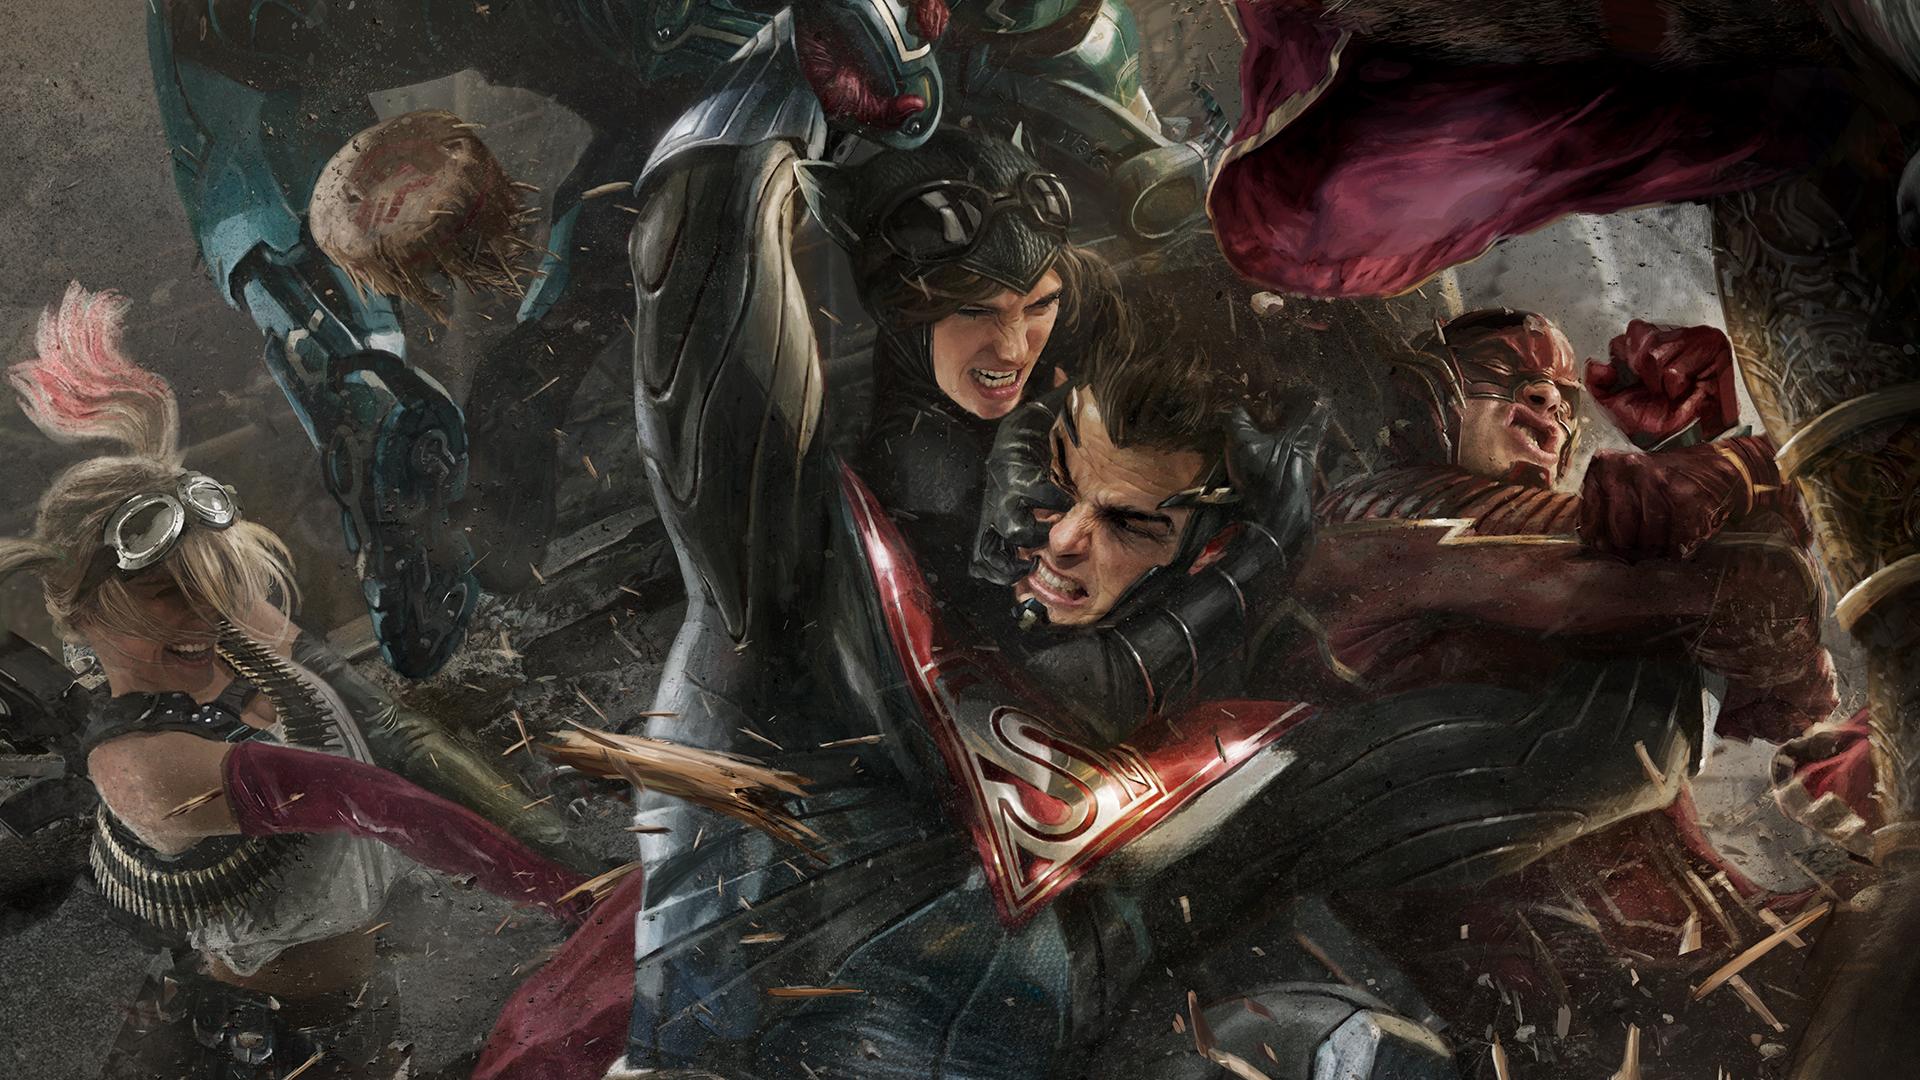 Injustice 2 hd games 4k wallpapers images backgrounds for El mural trailer